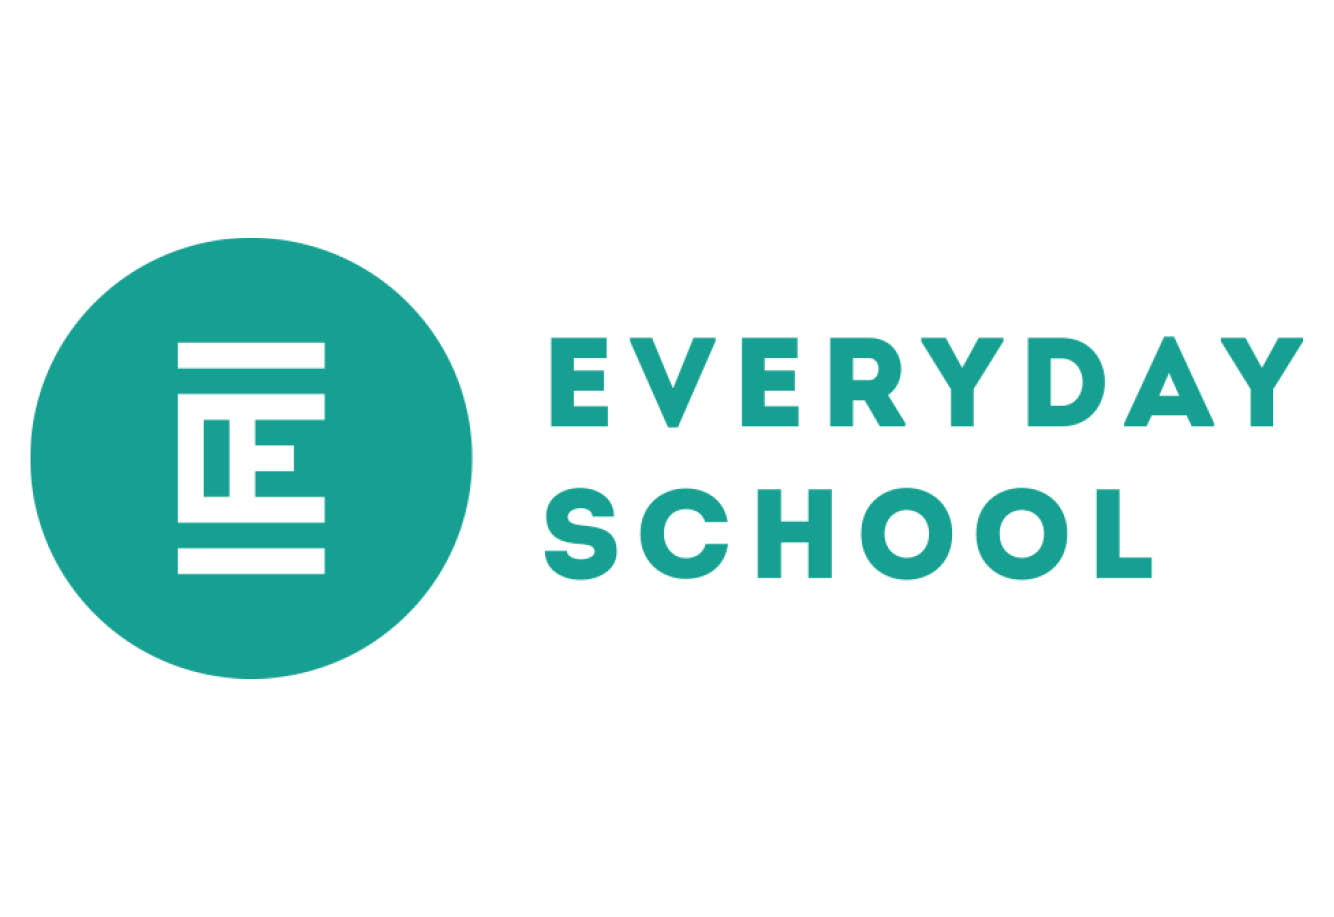 everyday-school logo.jpg